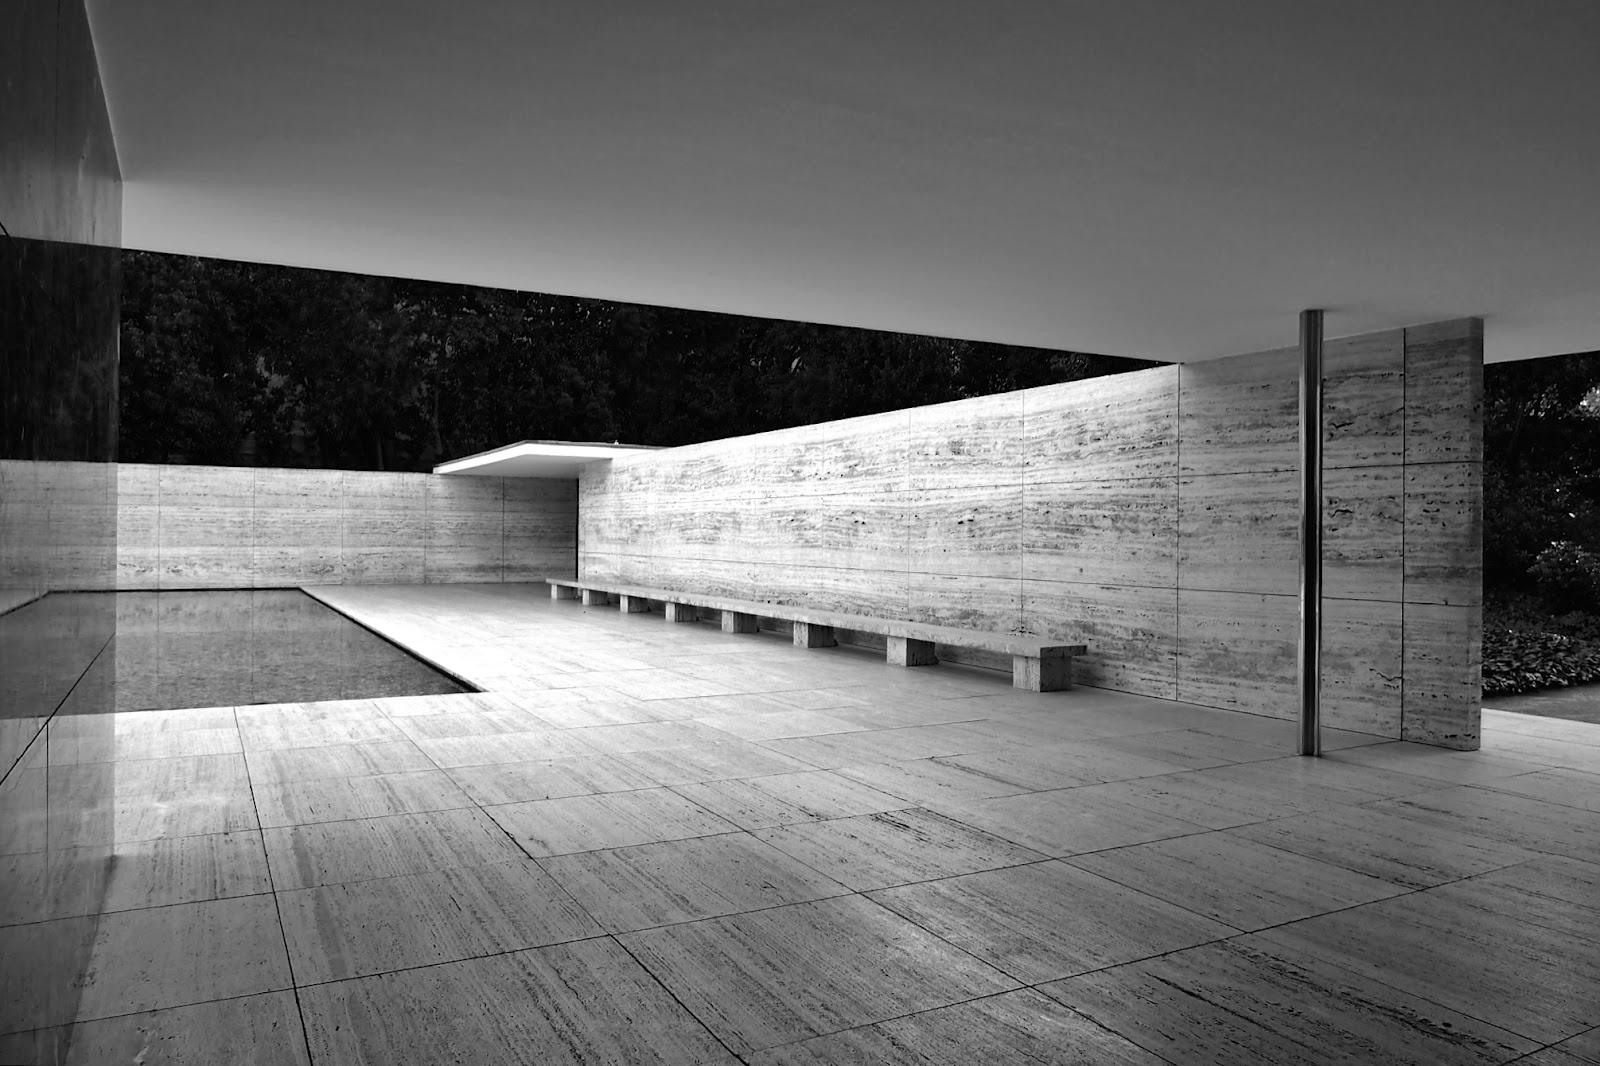 Barcelona pavilion exterior - Barcelona Pavilion Exterior 55